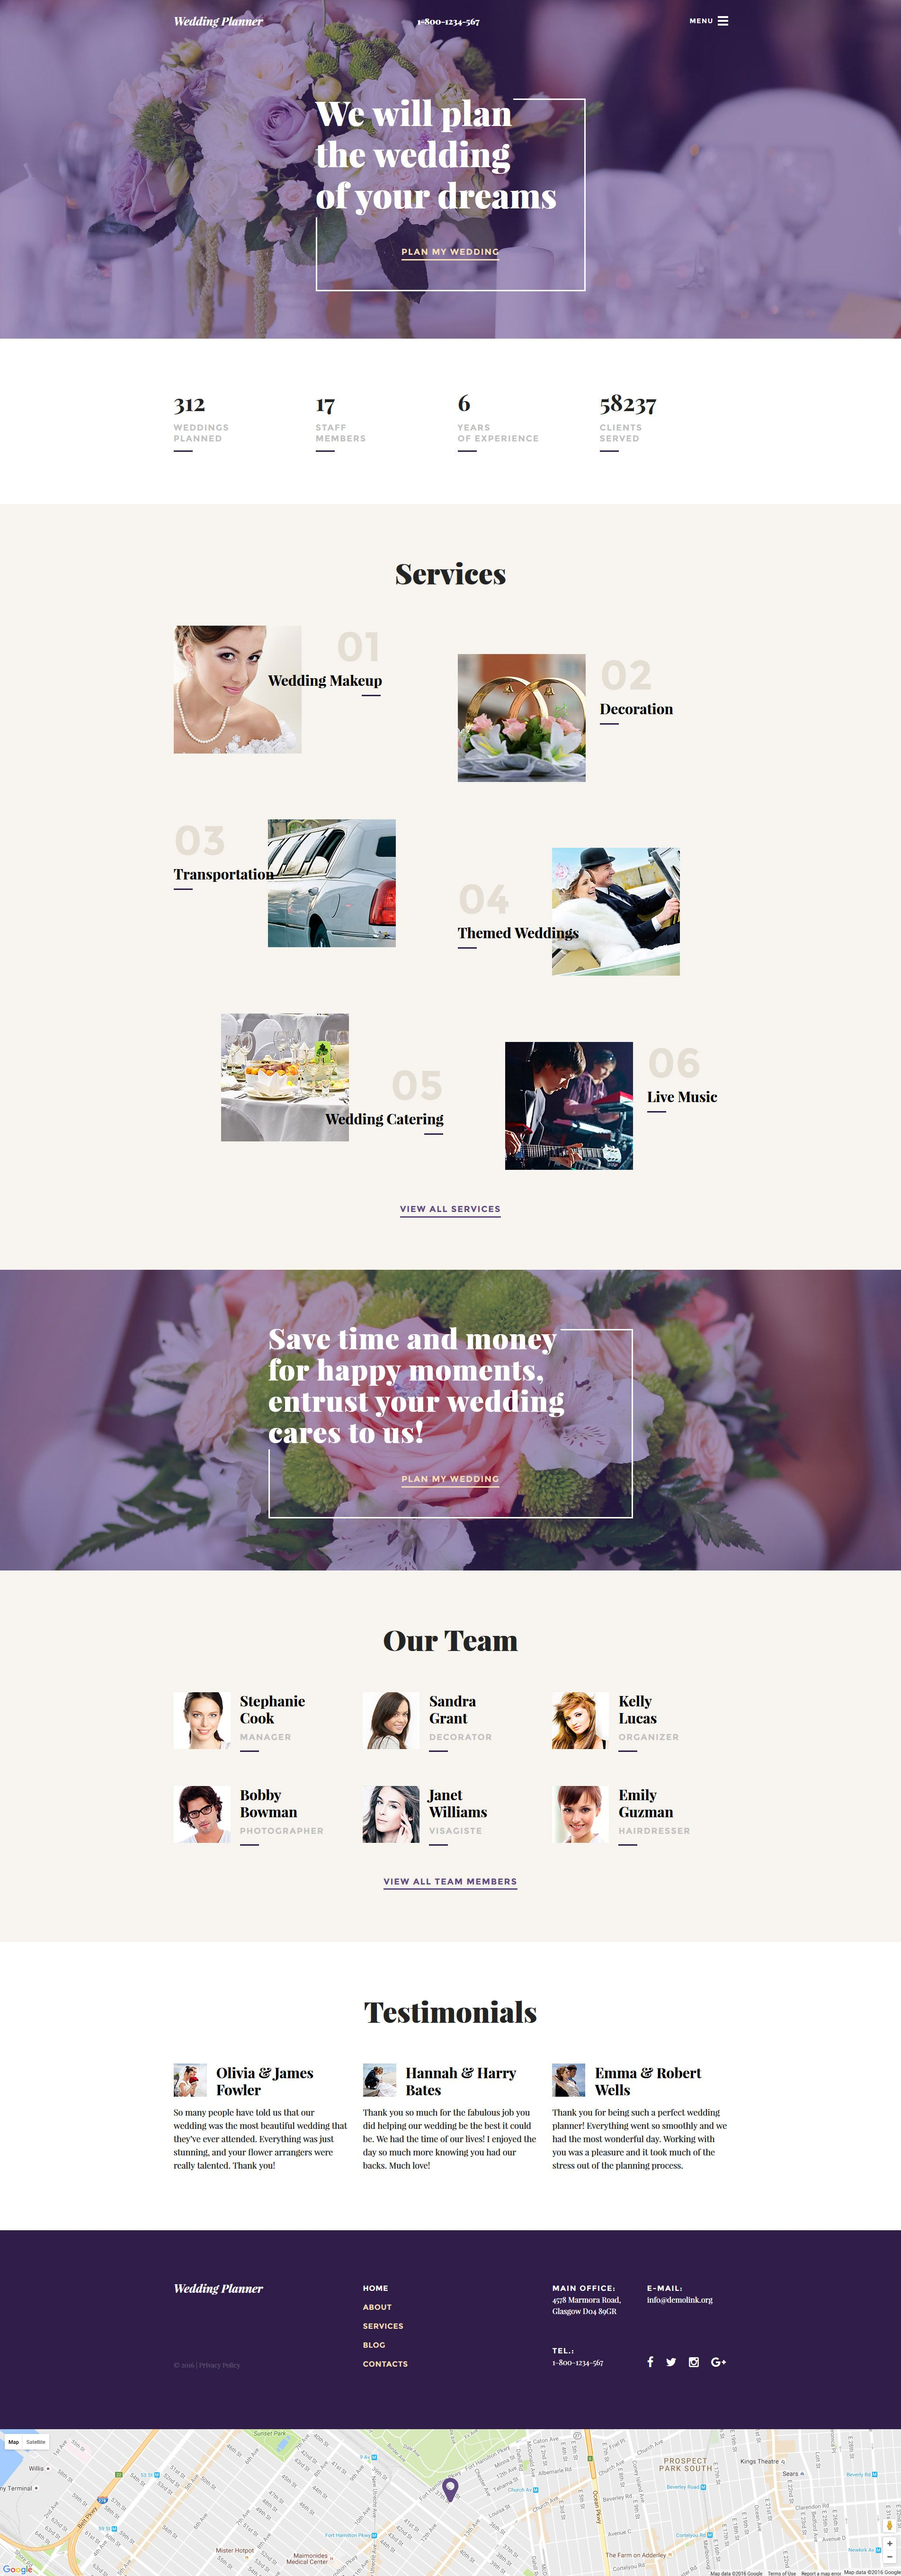 wedding planner responsive website template httpwwwtemplatemonstercom